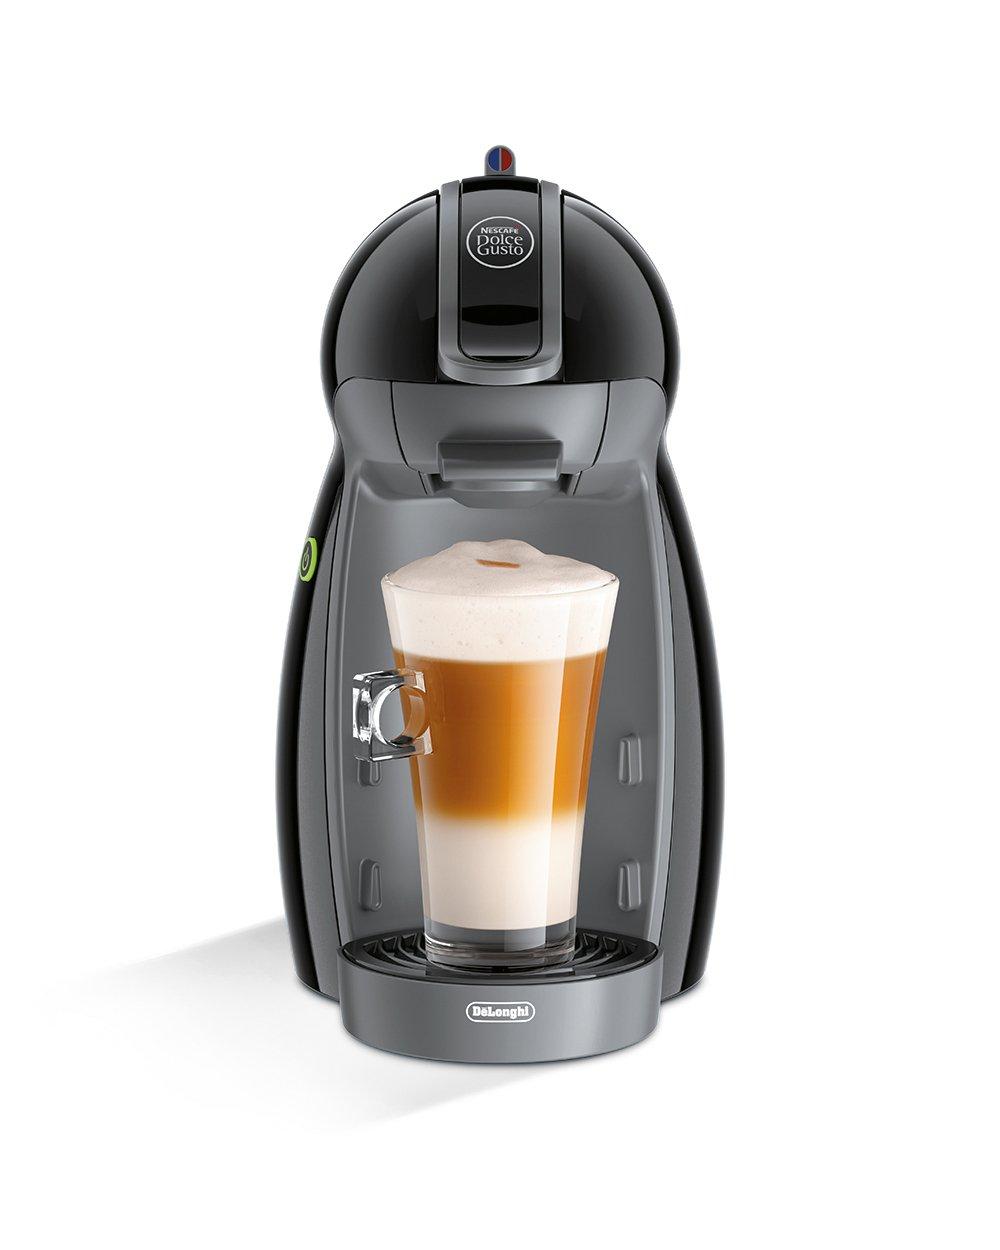 Delonghi Coffee Makers Nescafe Dolce G : Nescafe Dolce Gusto Piccolo BY DE Longhi EDG200 B Coffee AND Beverage Machine eBay